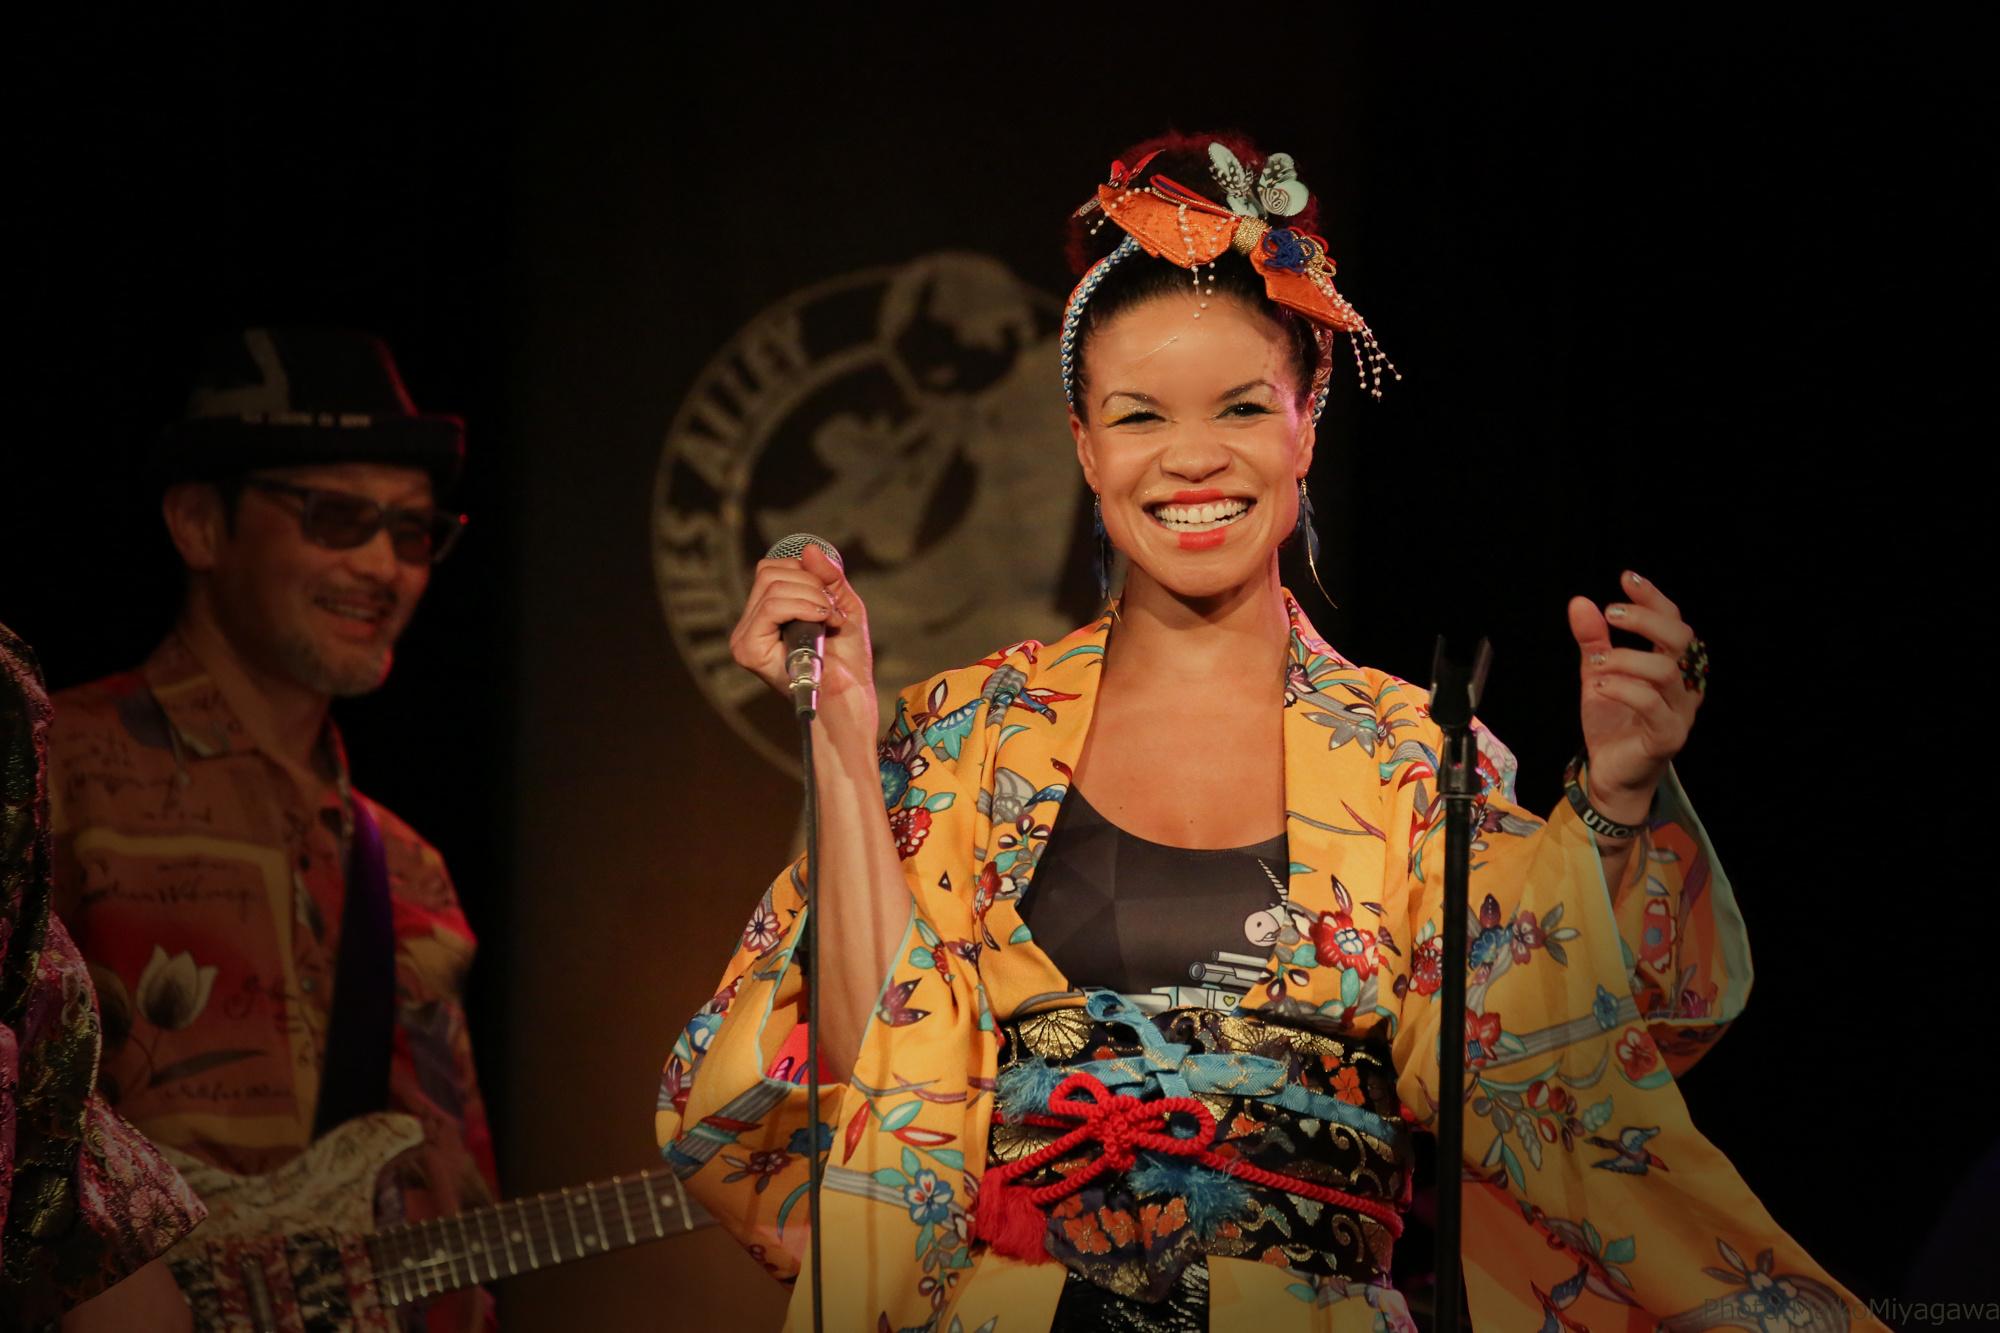 Geaisha Show in Tokyo